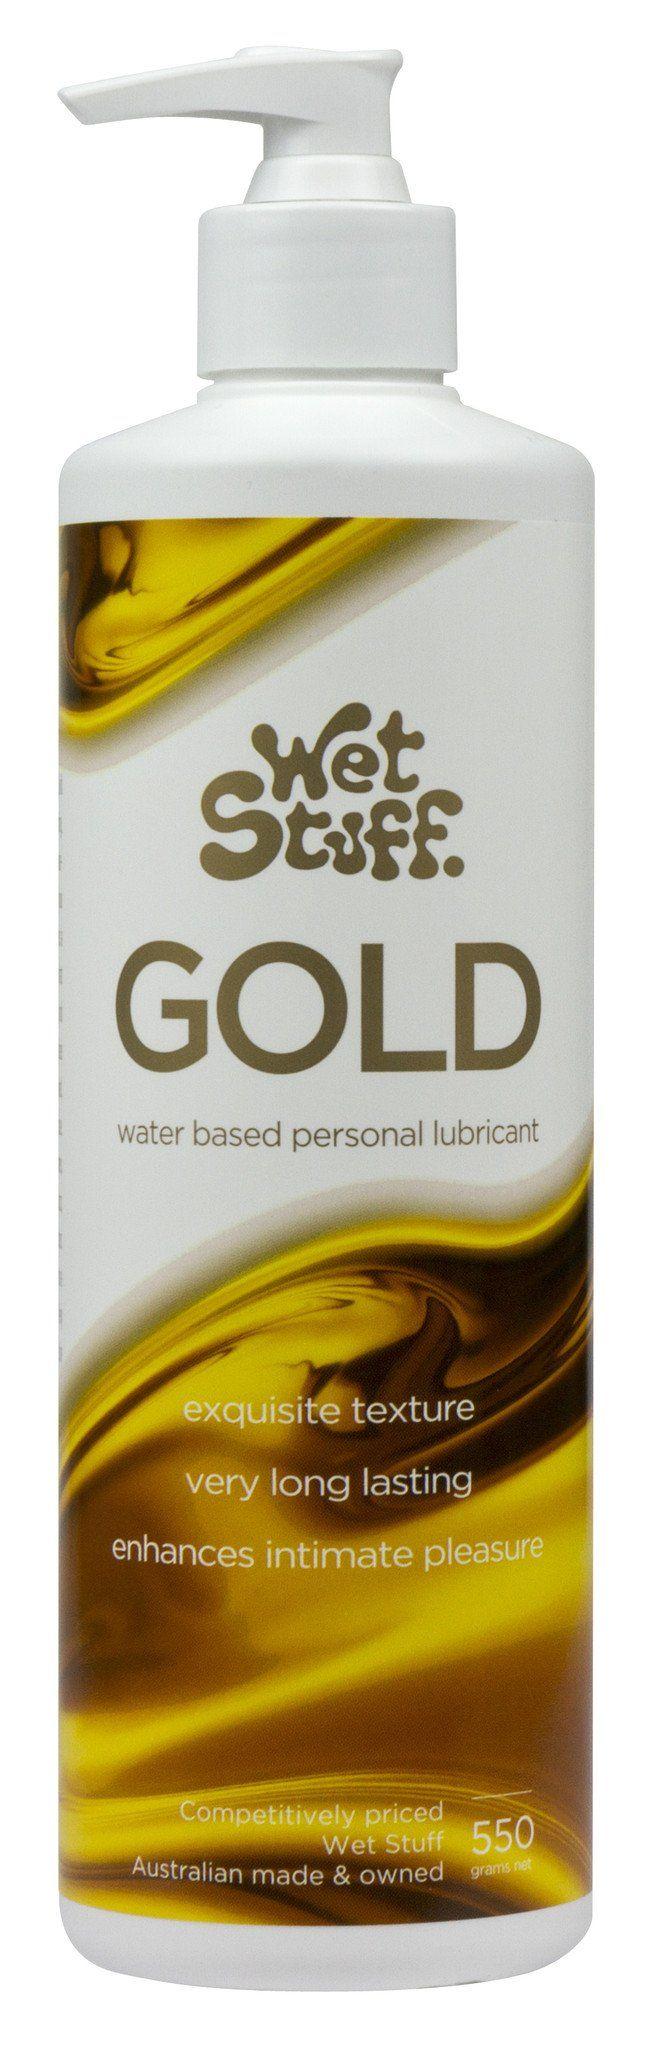 Wet Stuff Gold 550g  #red #junglejuiceplatinum #Odorizer #blackant #lingerie #realdoll #amylnitrate #king #Small #Amsterdam